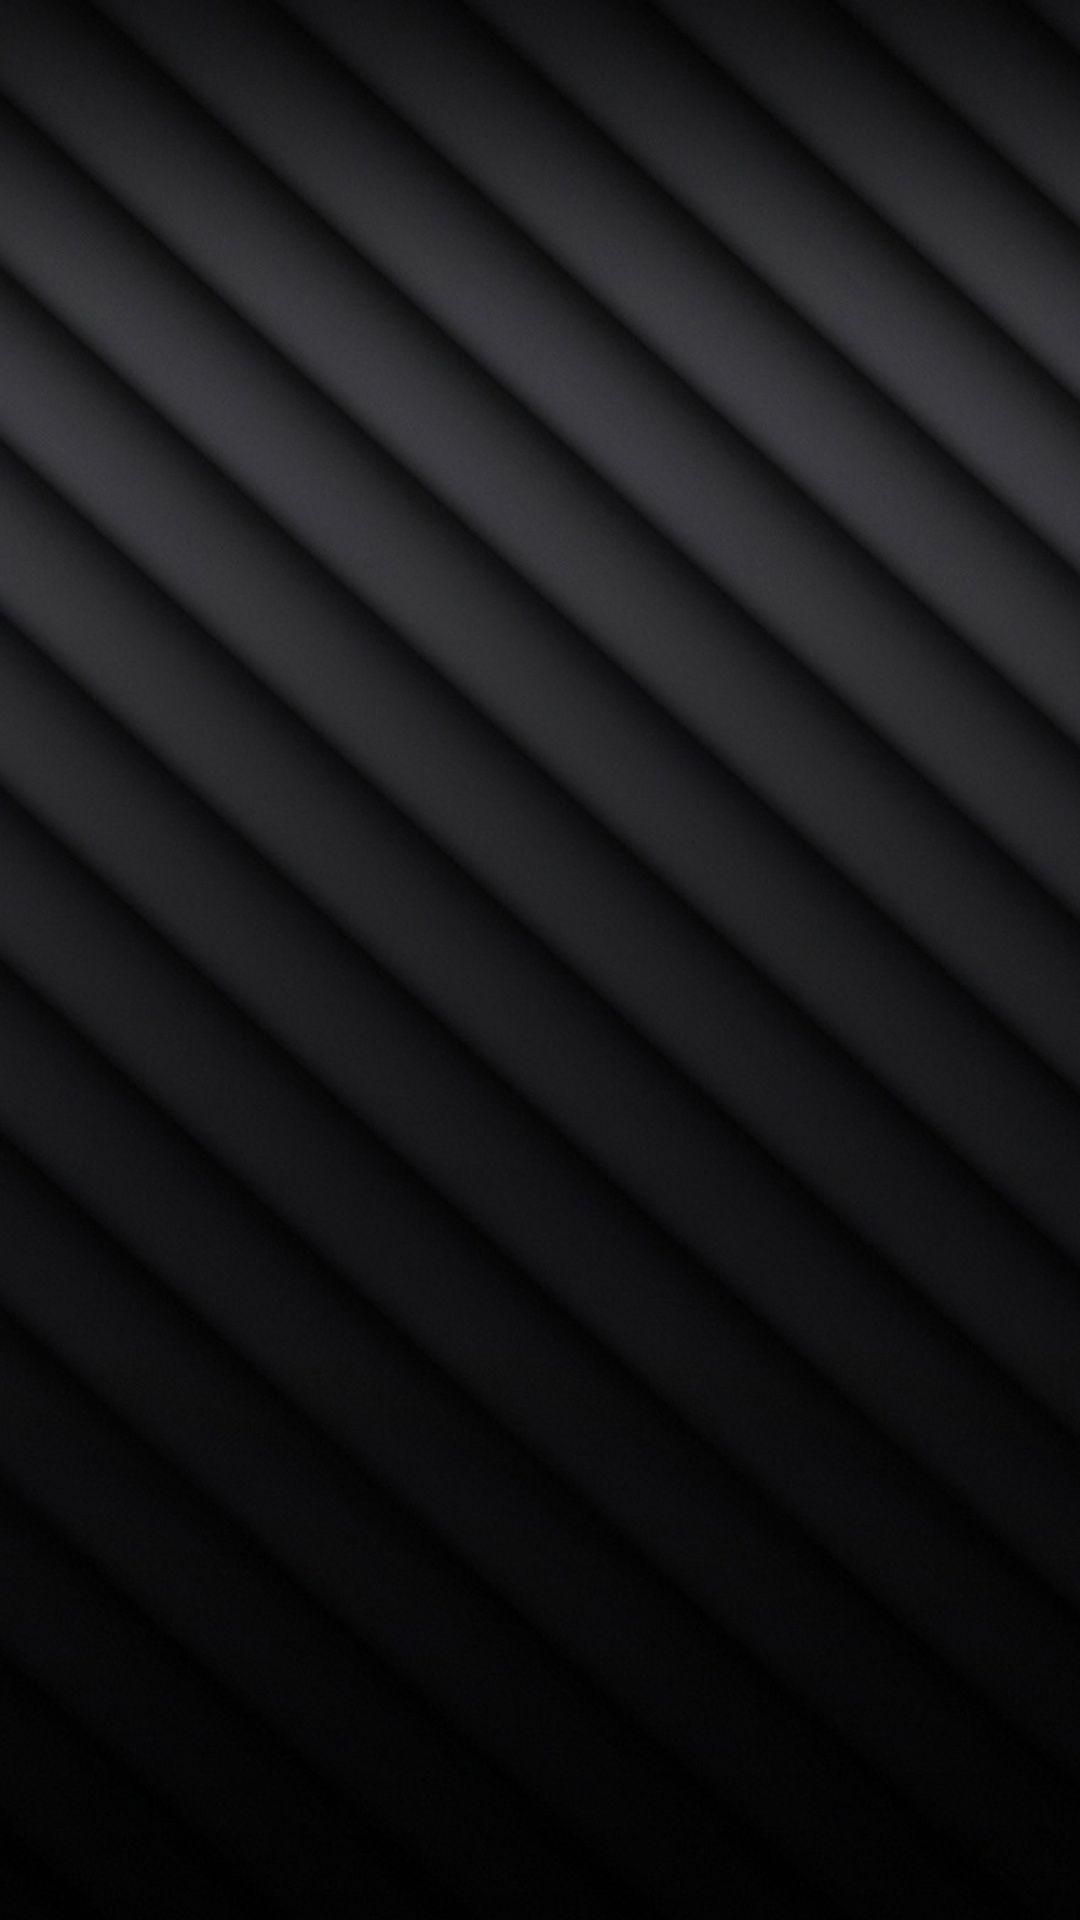 Black Iphone 5 Wallpapers Top Free Black Iphone 5